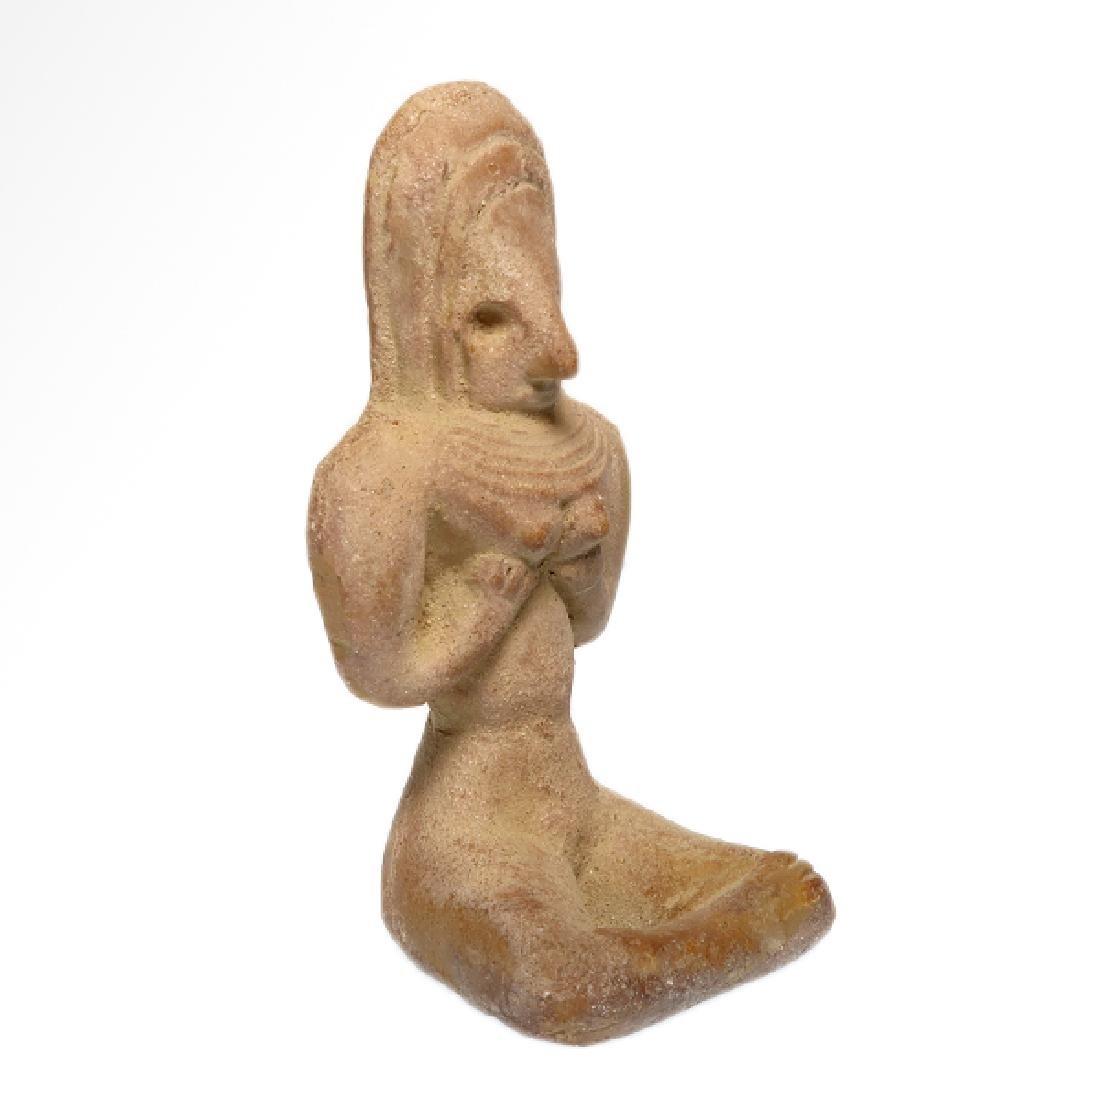 Indus-Valley Mother Goddess, Harappan, c. 2400 B.C. - 3